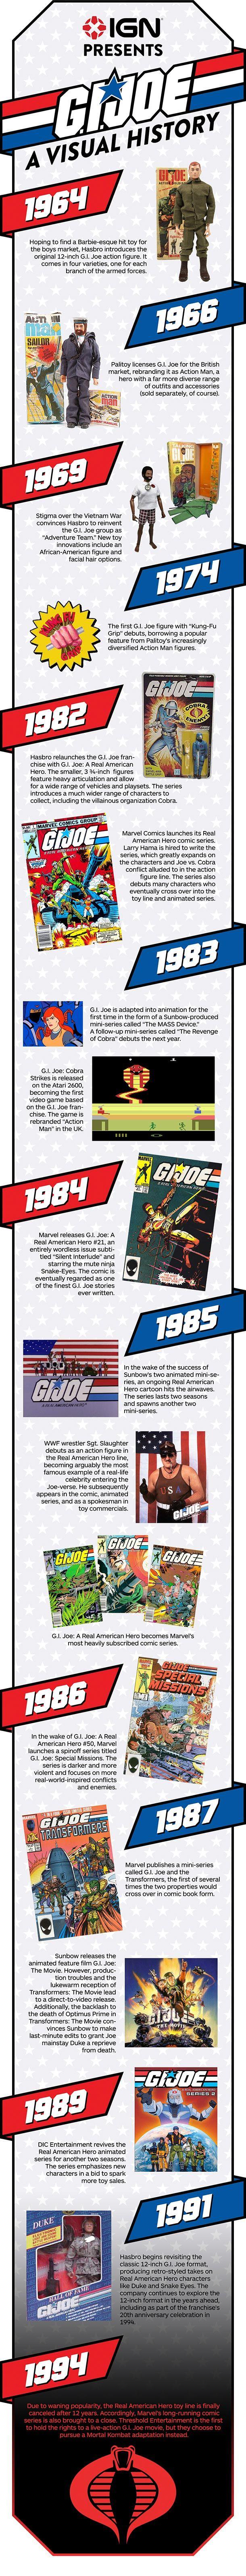 GIJoe-InfographicPartOne-610Wide